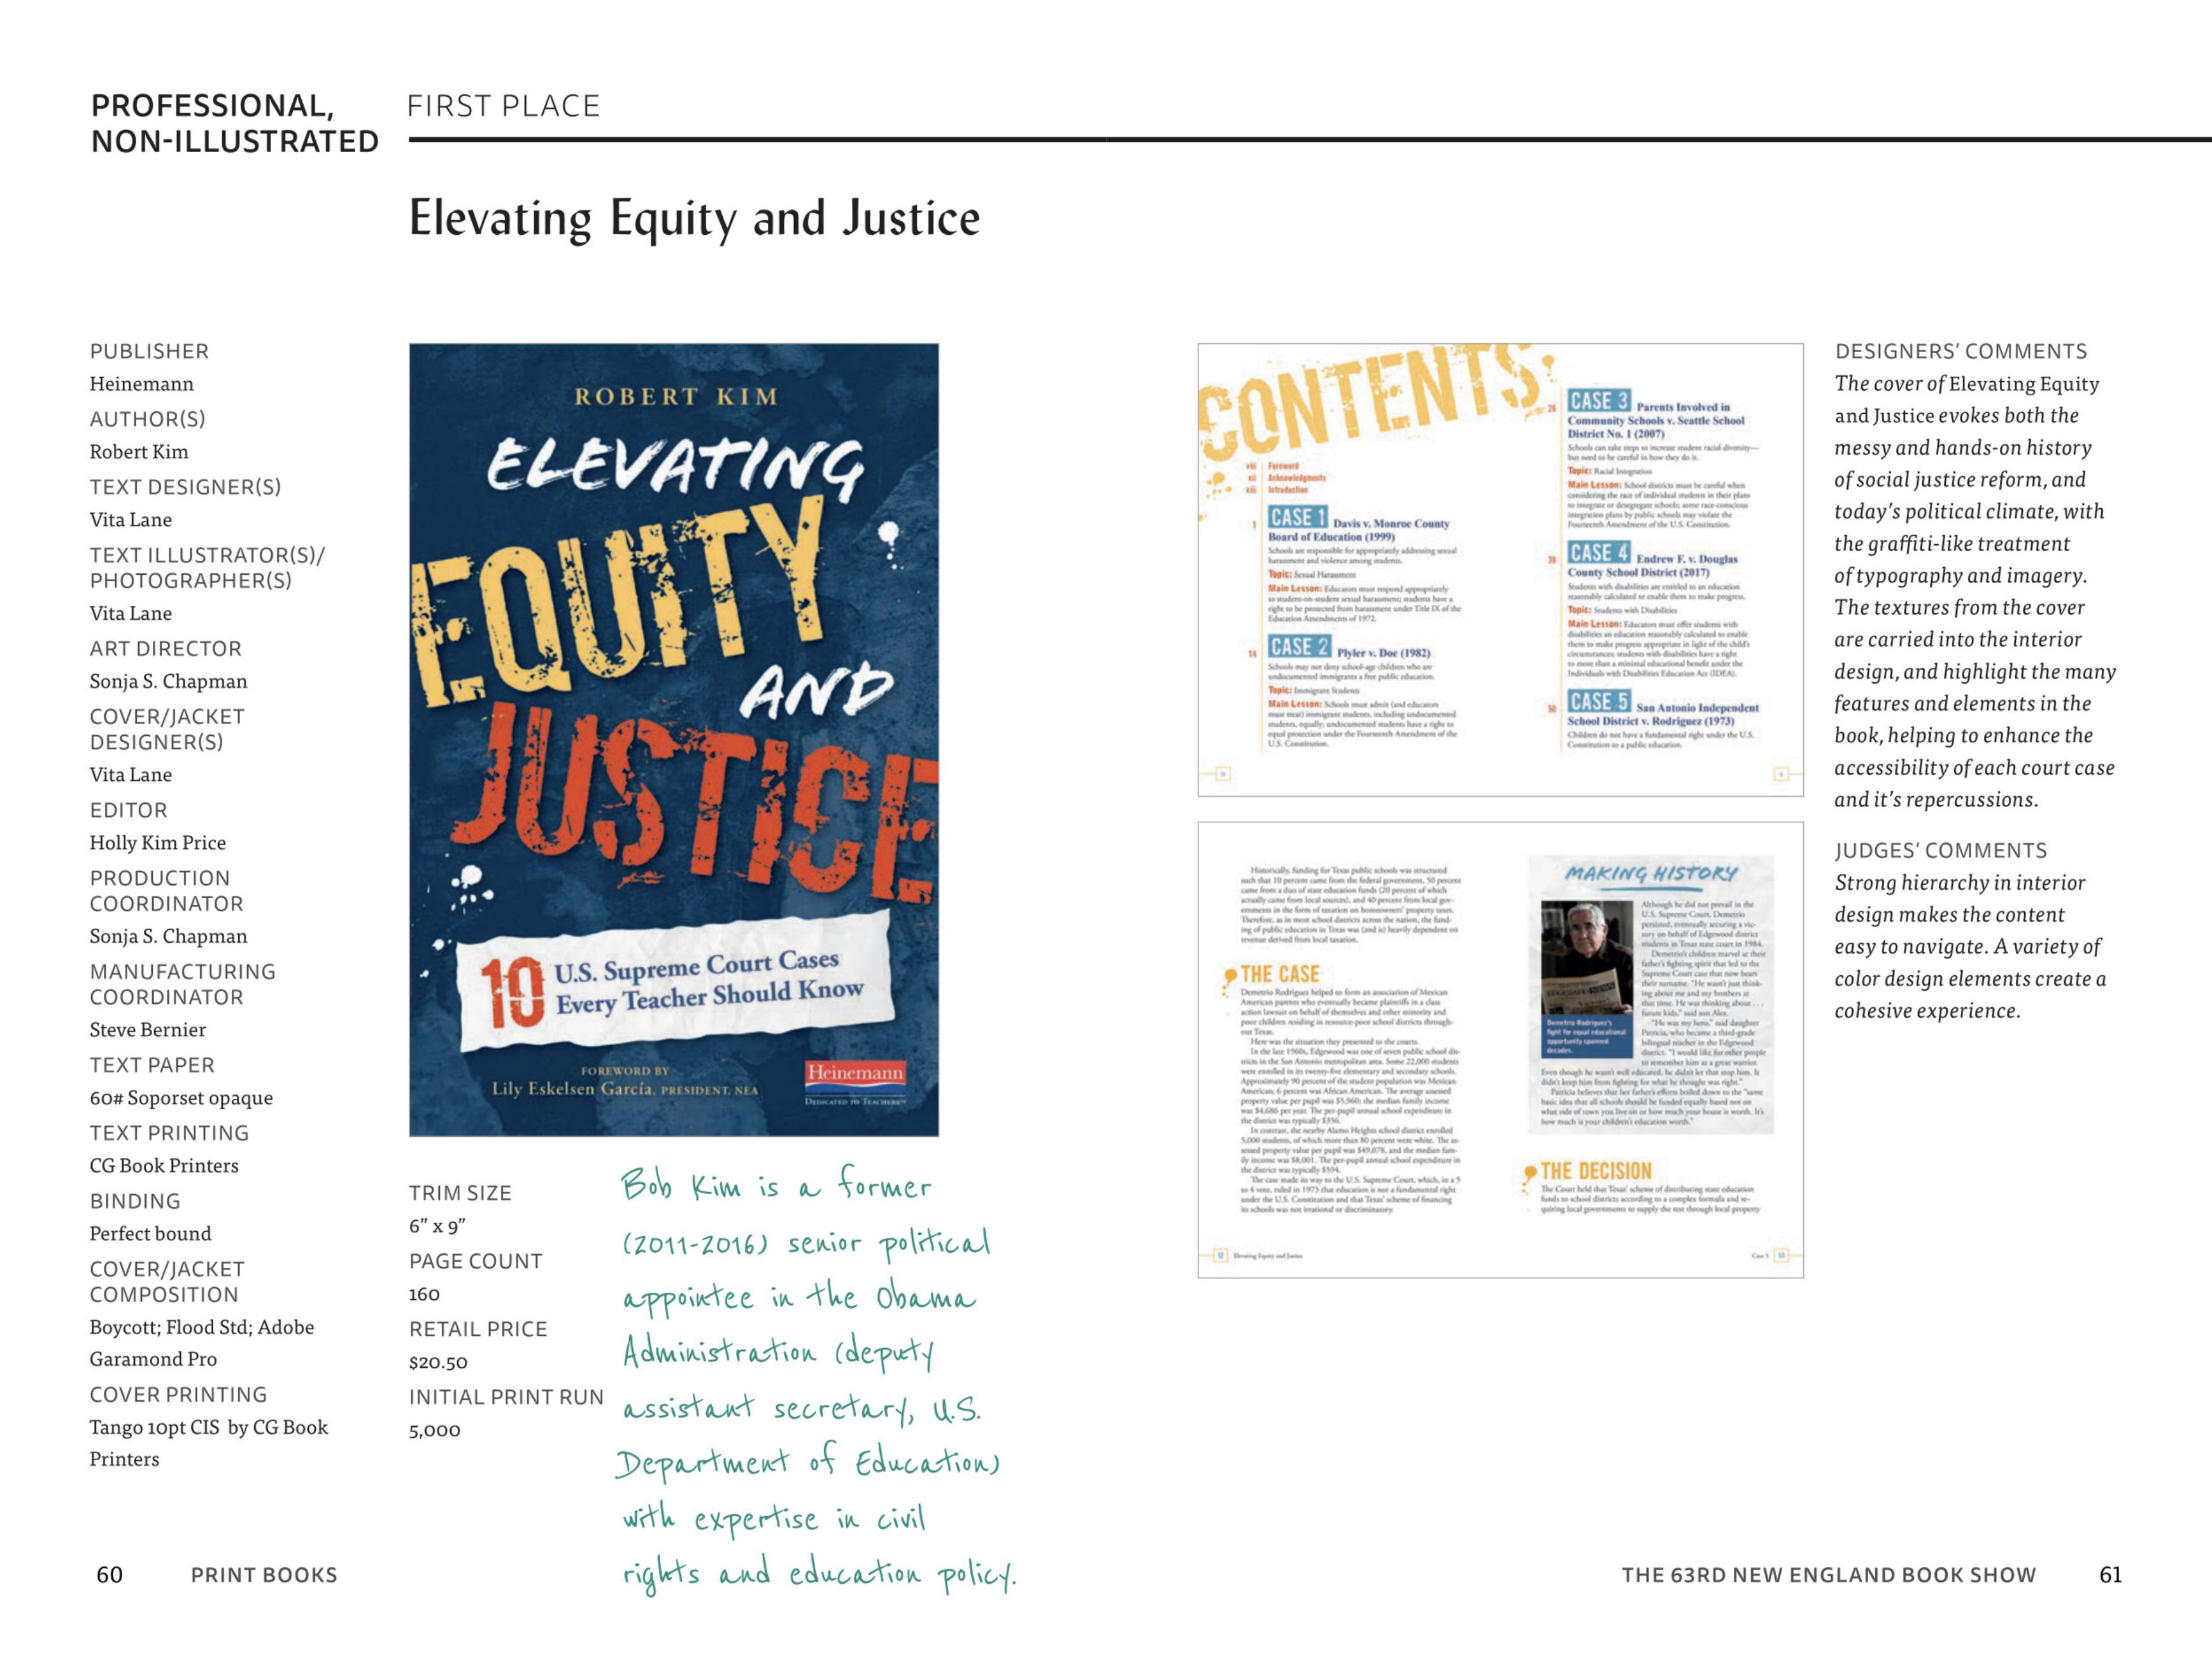 NEBS Elevating Equity